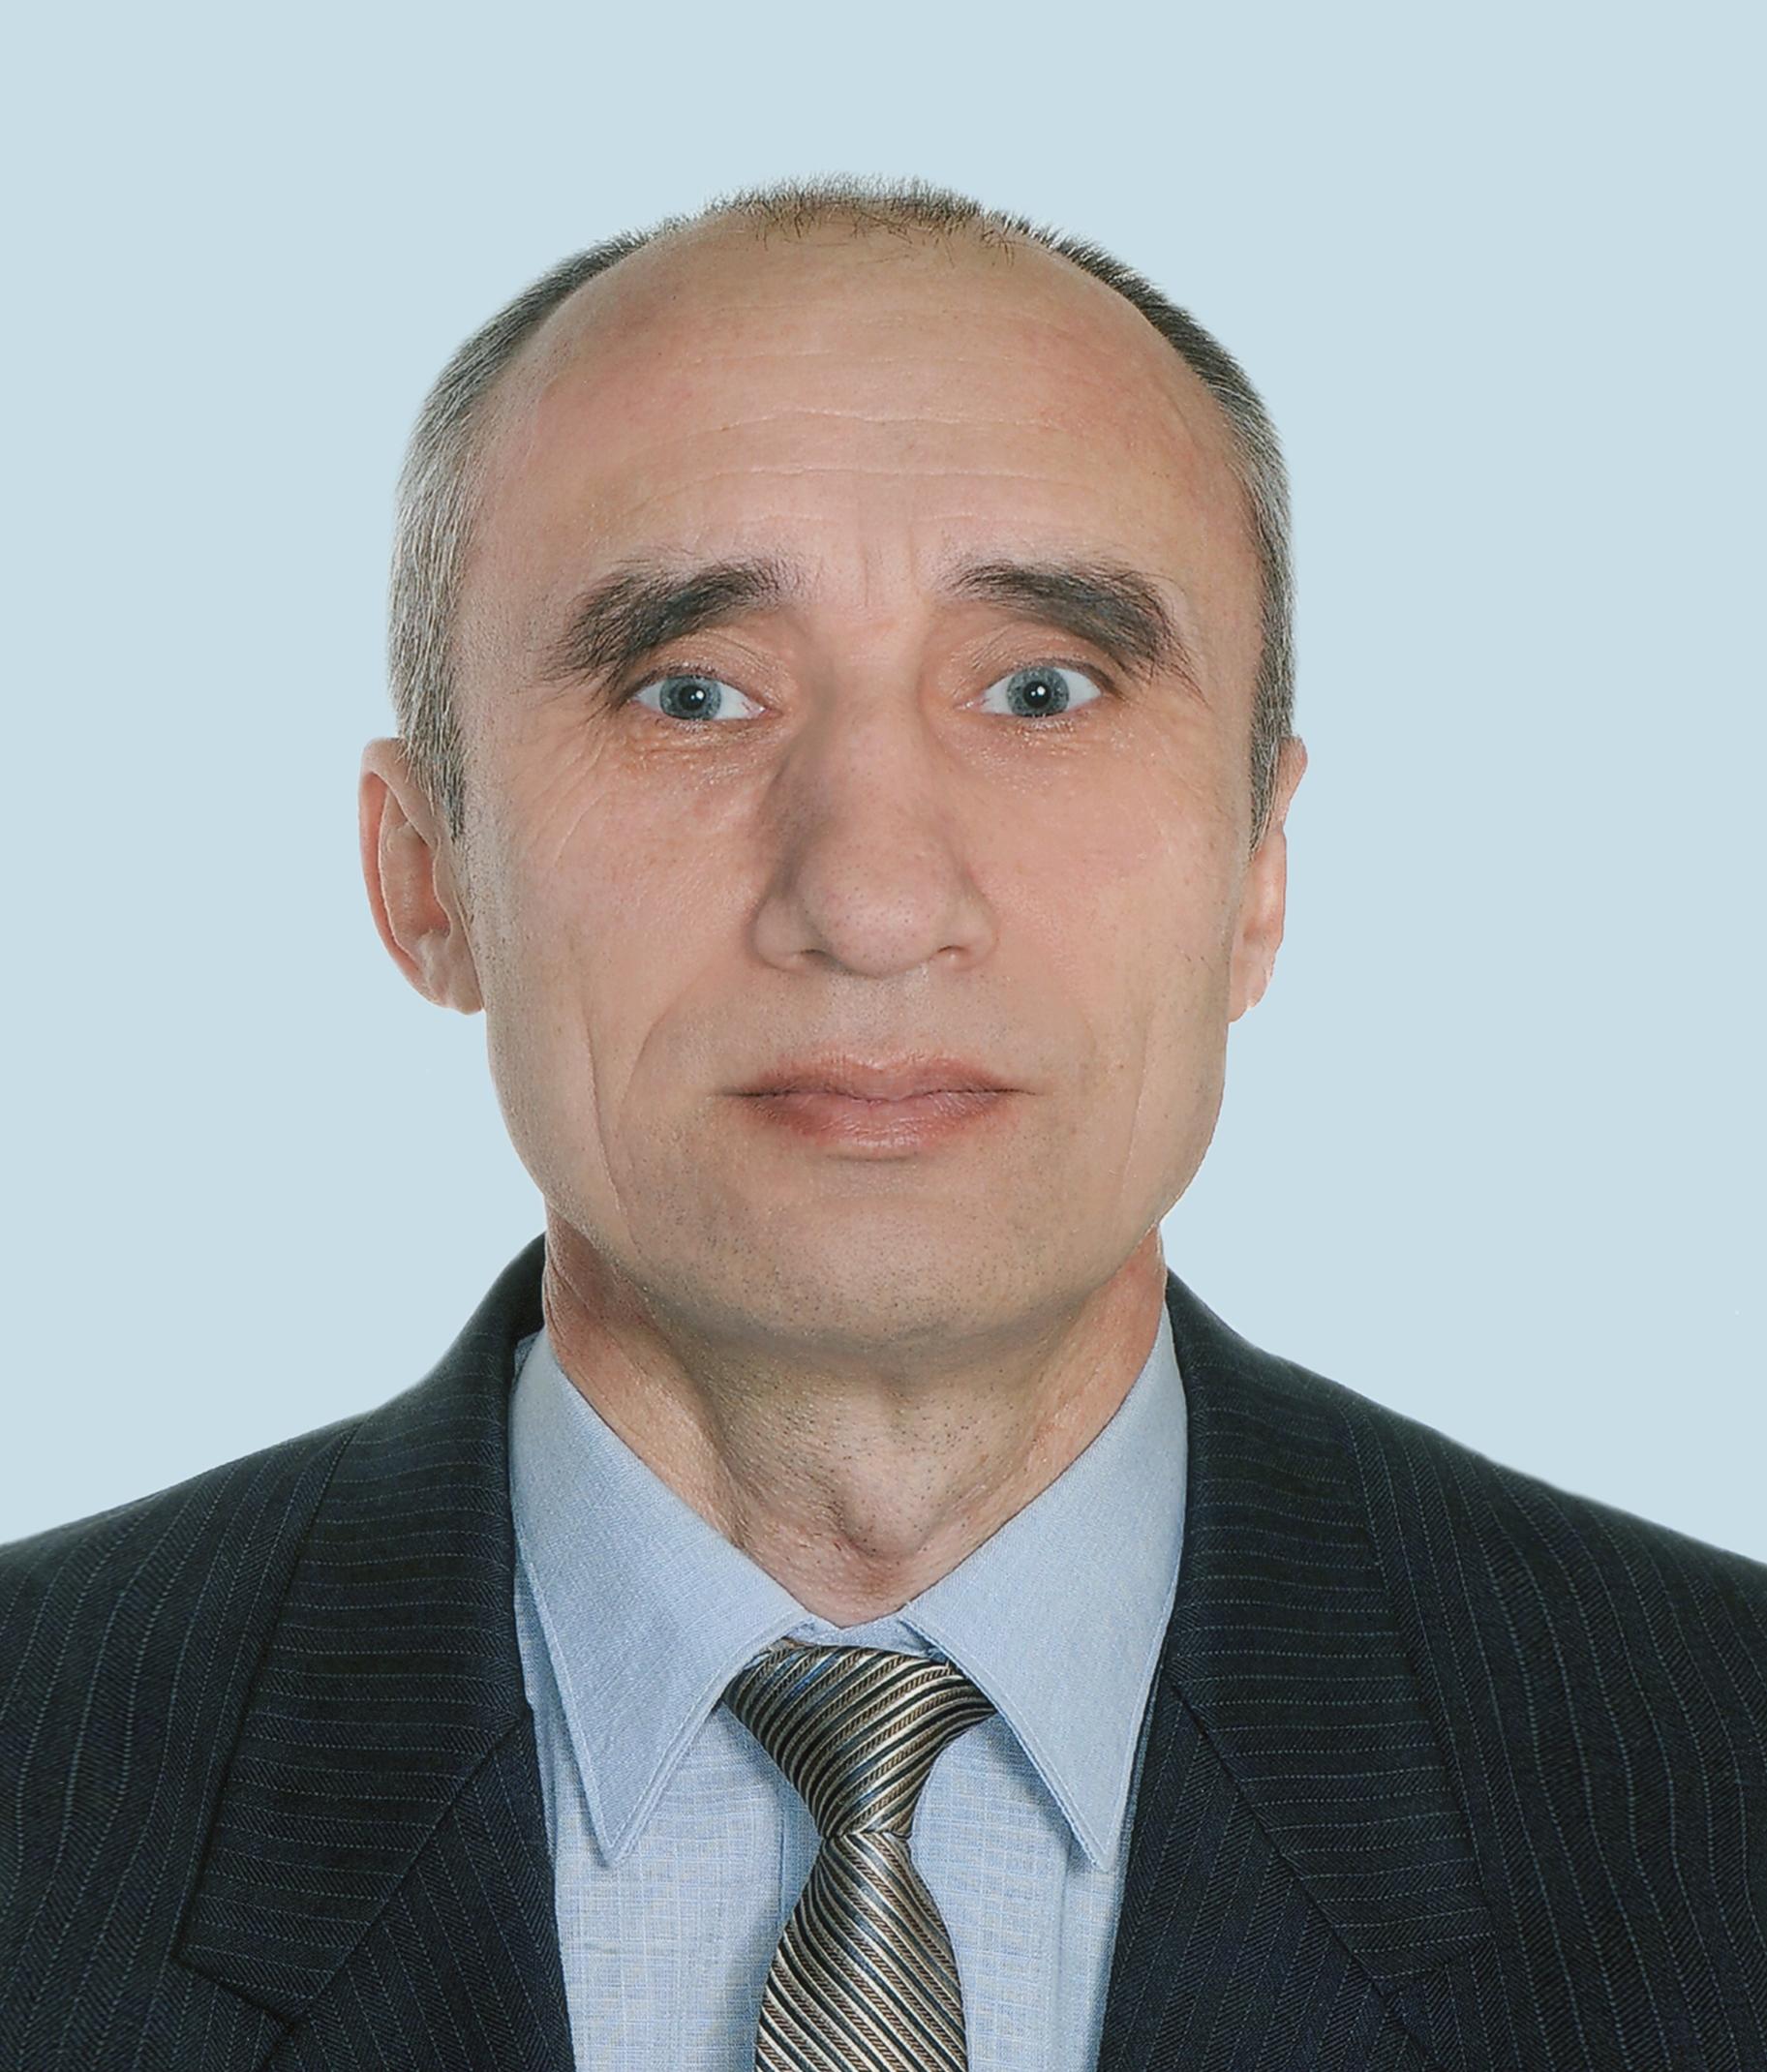 Ненашки Сергей Николаевич